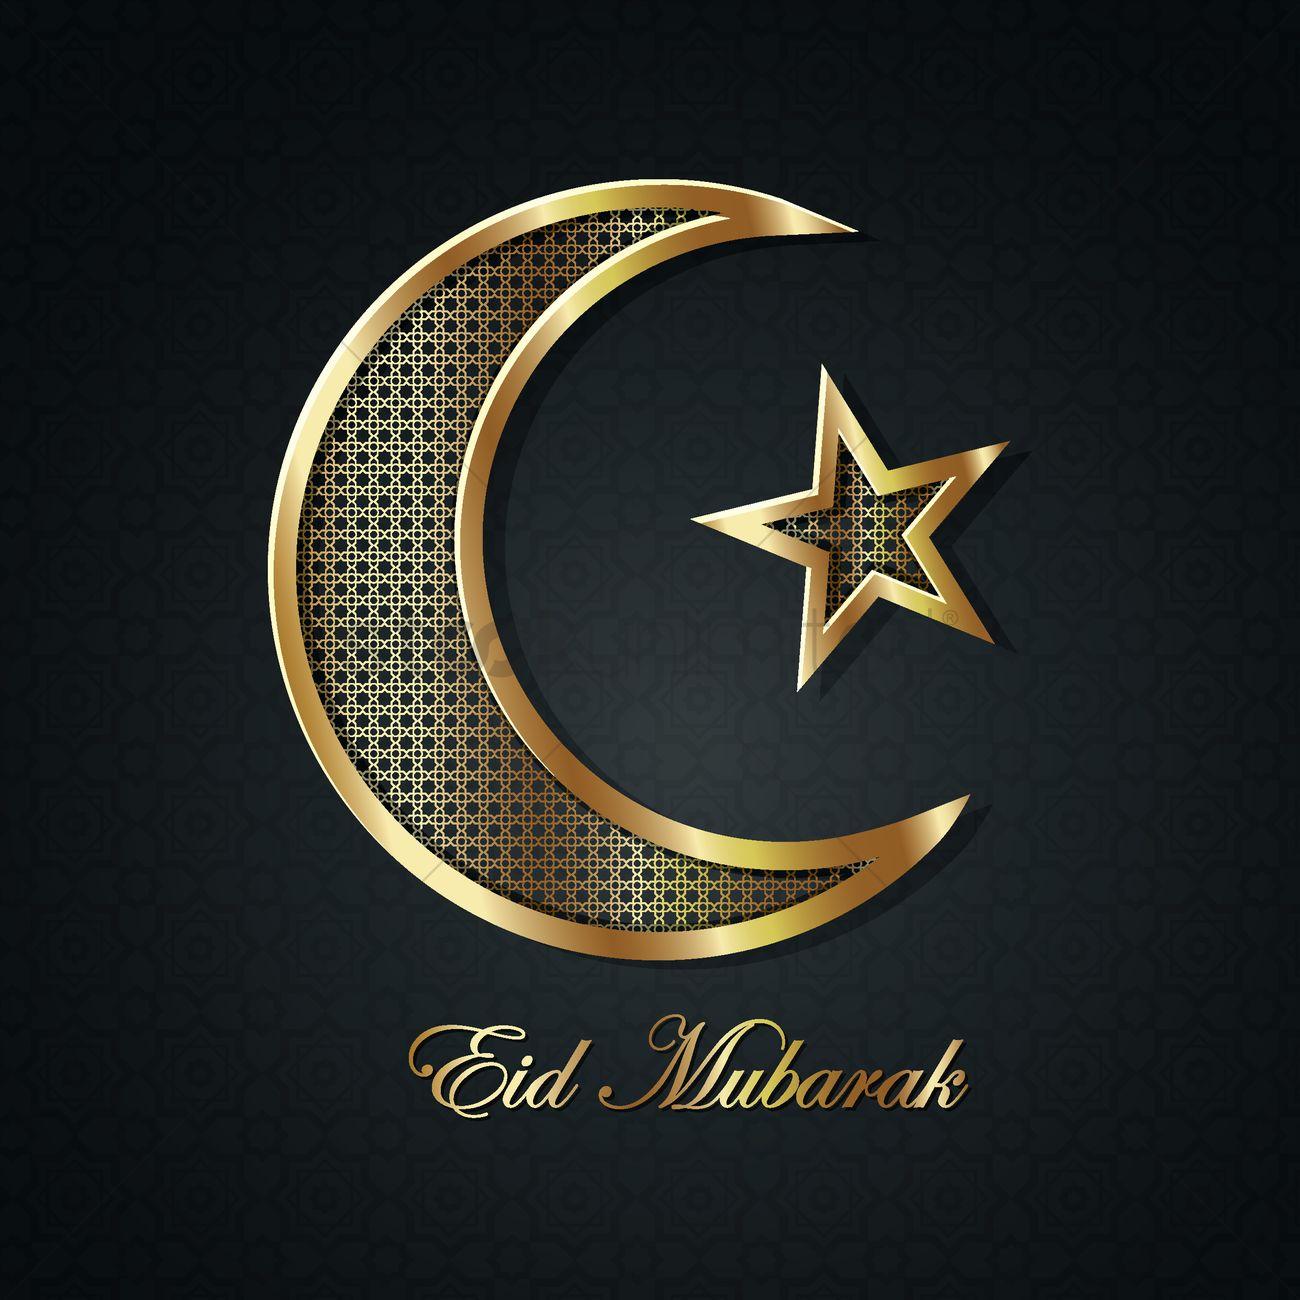 eid mubarak greeting vector image 1828261 stockunlimited